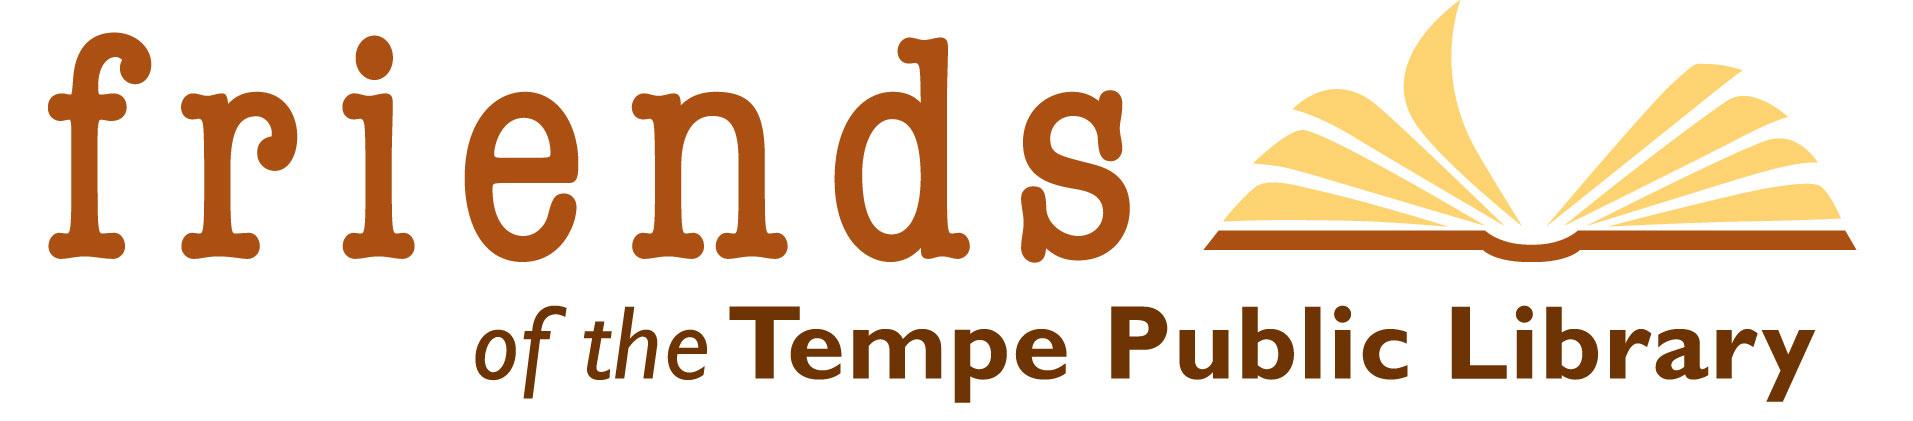 FotTPL_Main logo